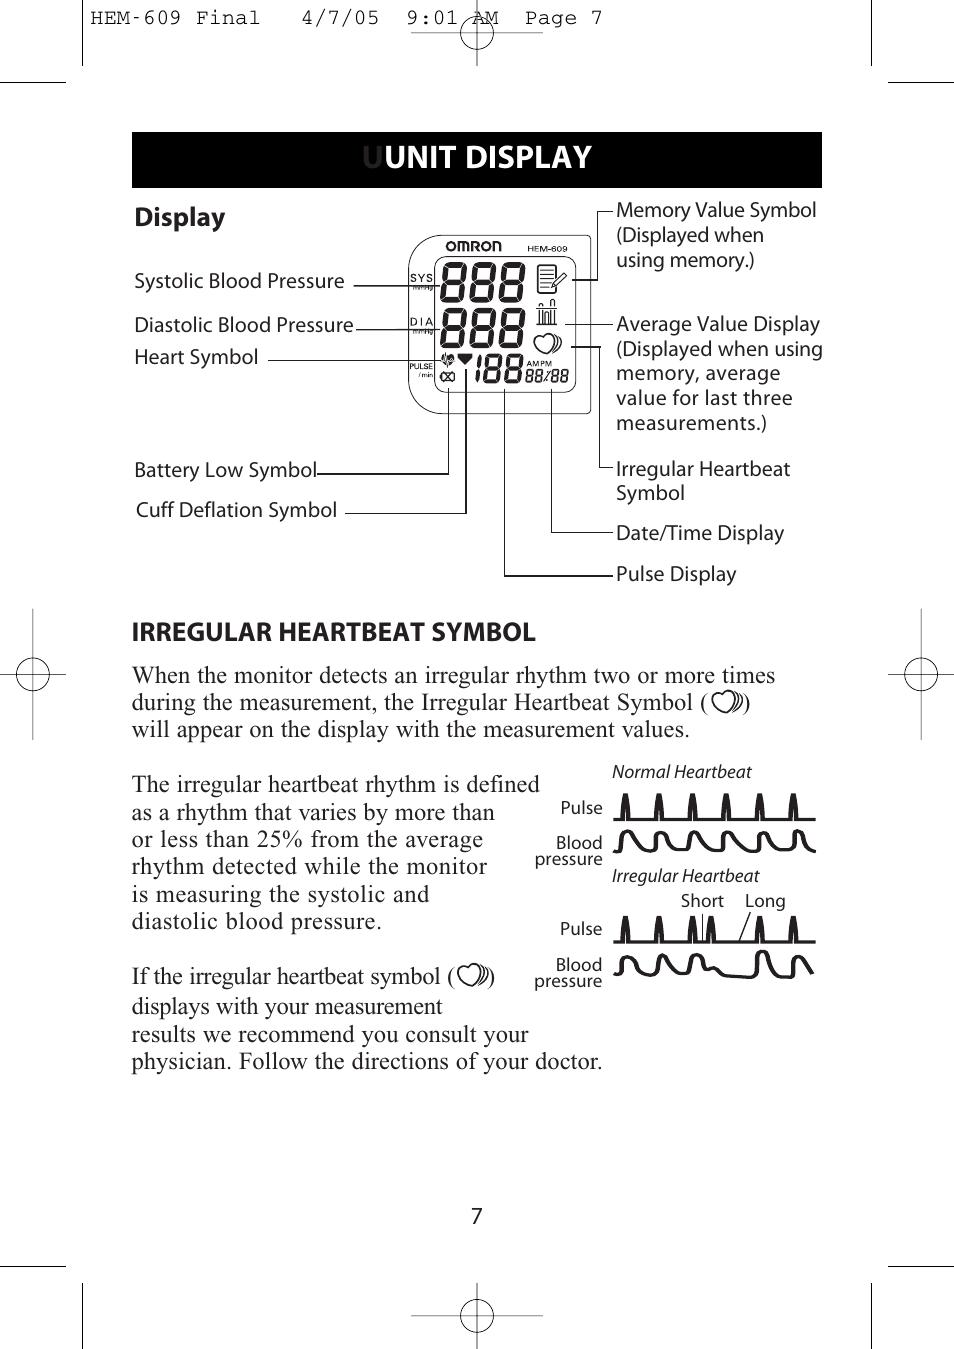 Uunit Display Display Irregular Heartbeat Symbol Omron